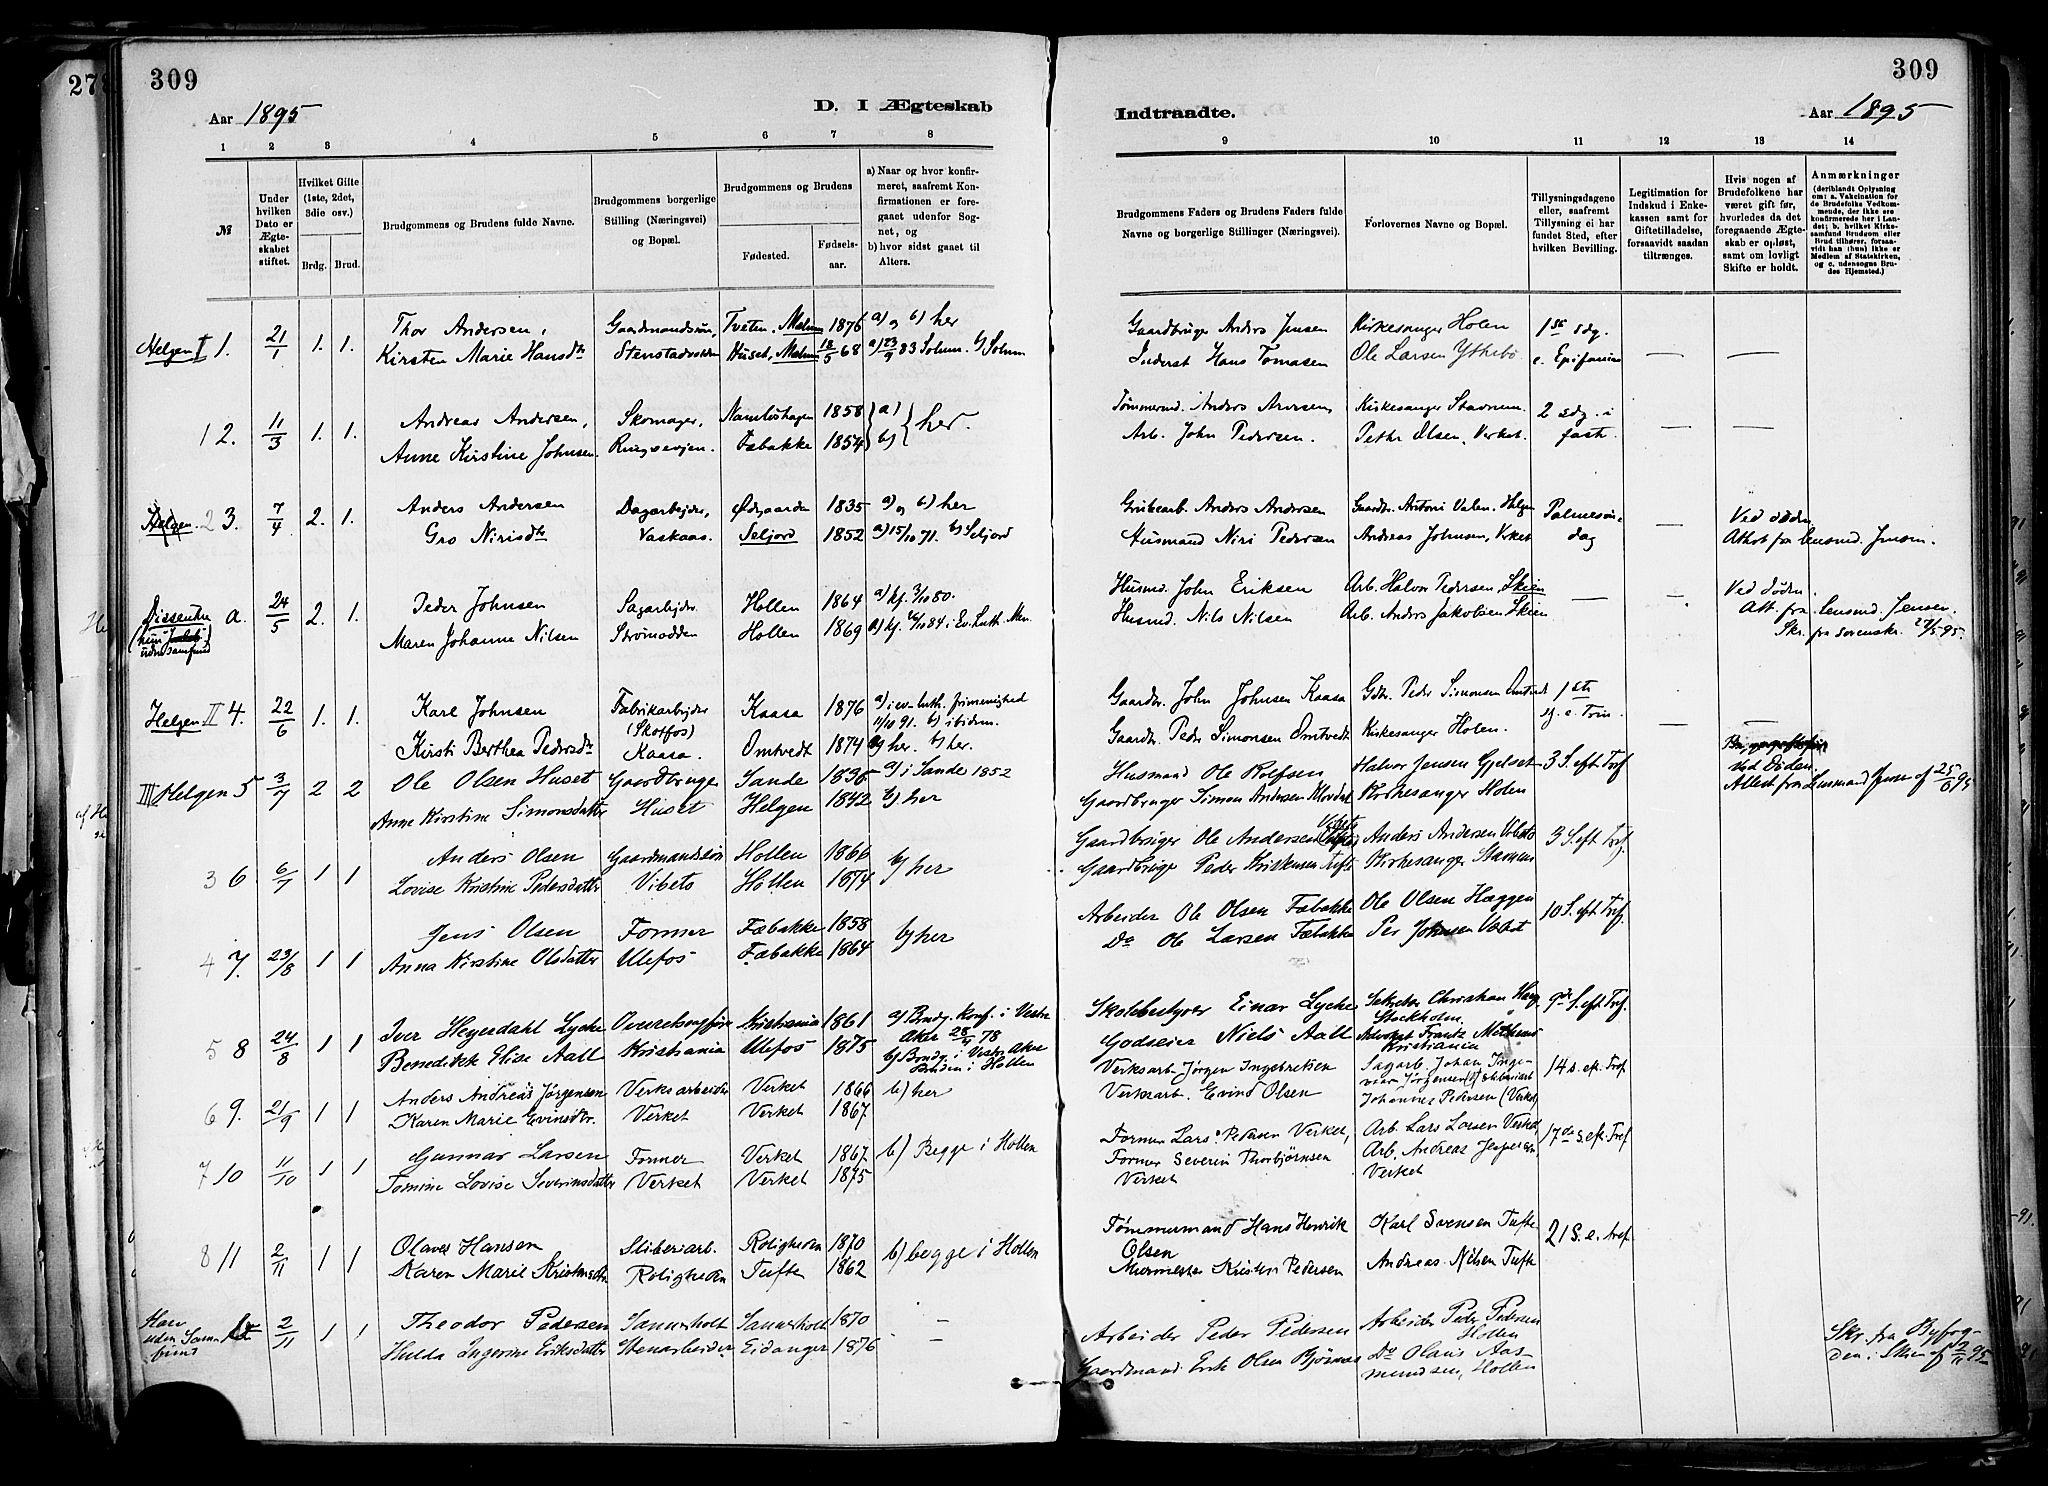 SAKO, Holla kirkebøker, F/Fa/L0008: Ministerialbok nr. 8, 1882-1897, s. 309